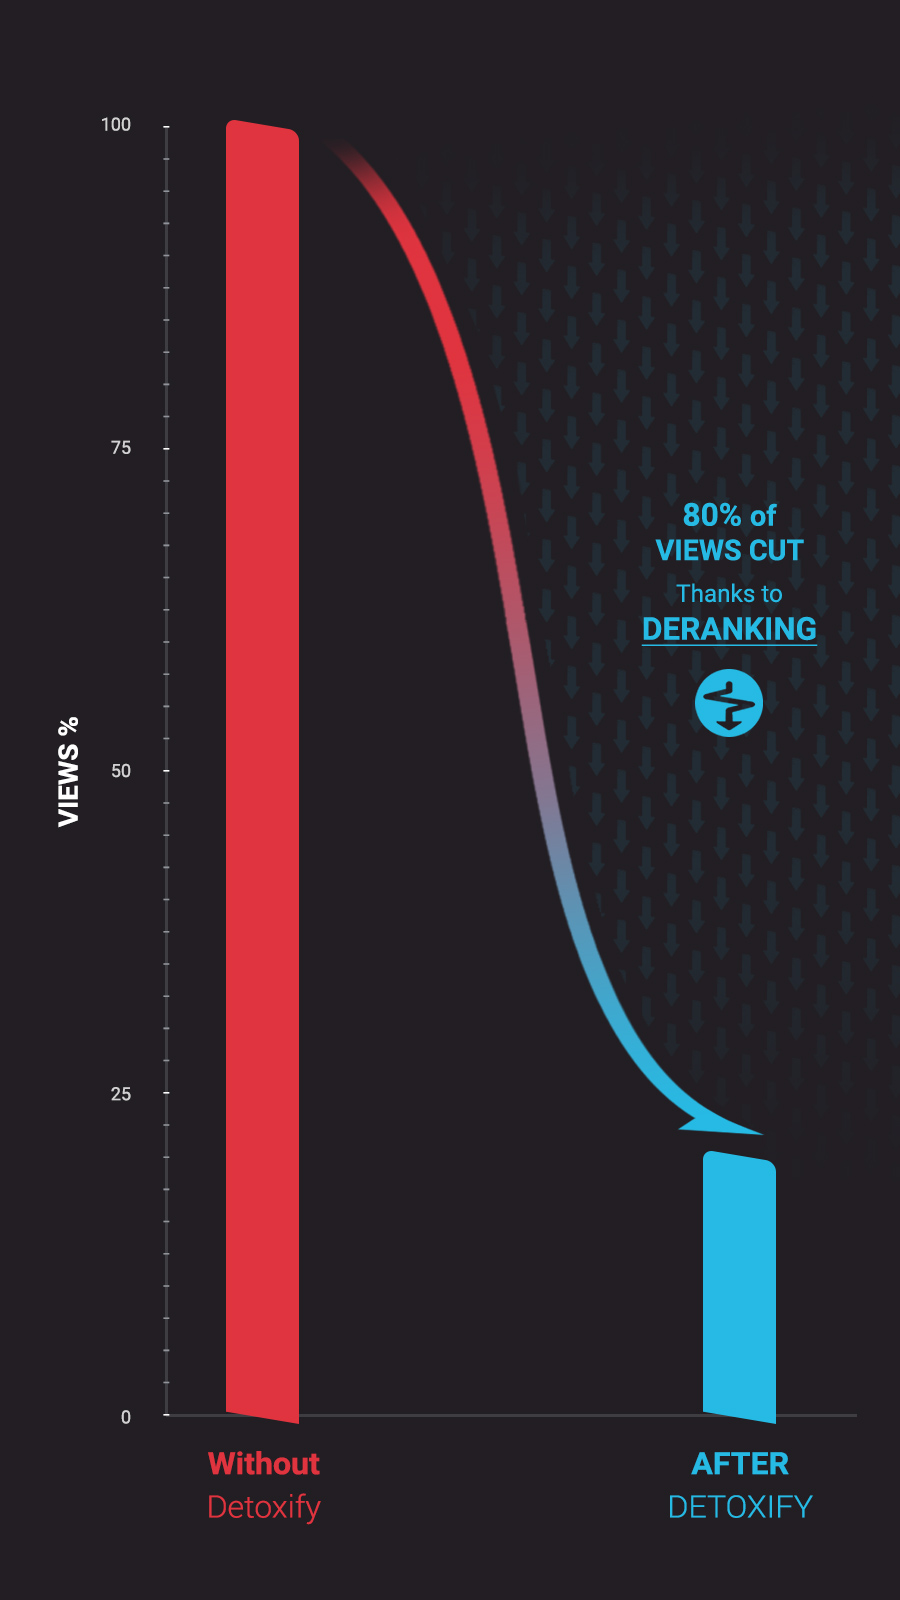 https://avaazimages.avaaz.org/health_report_dta_graph.jpg